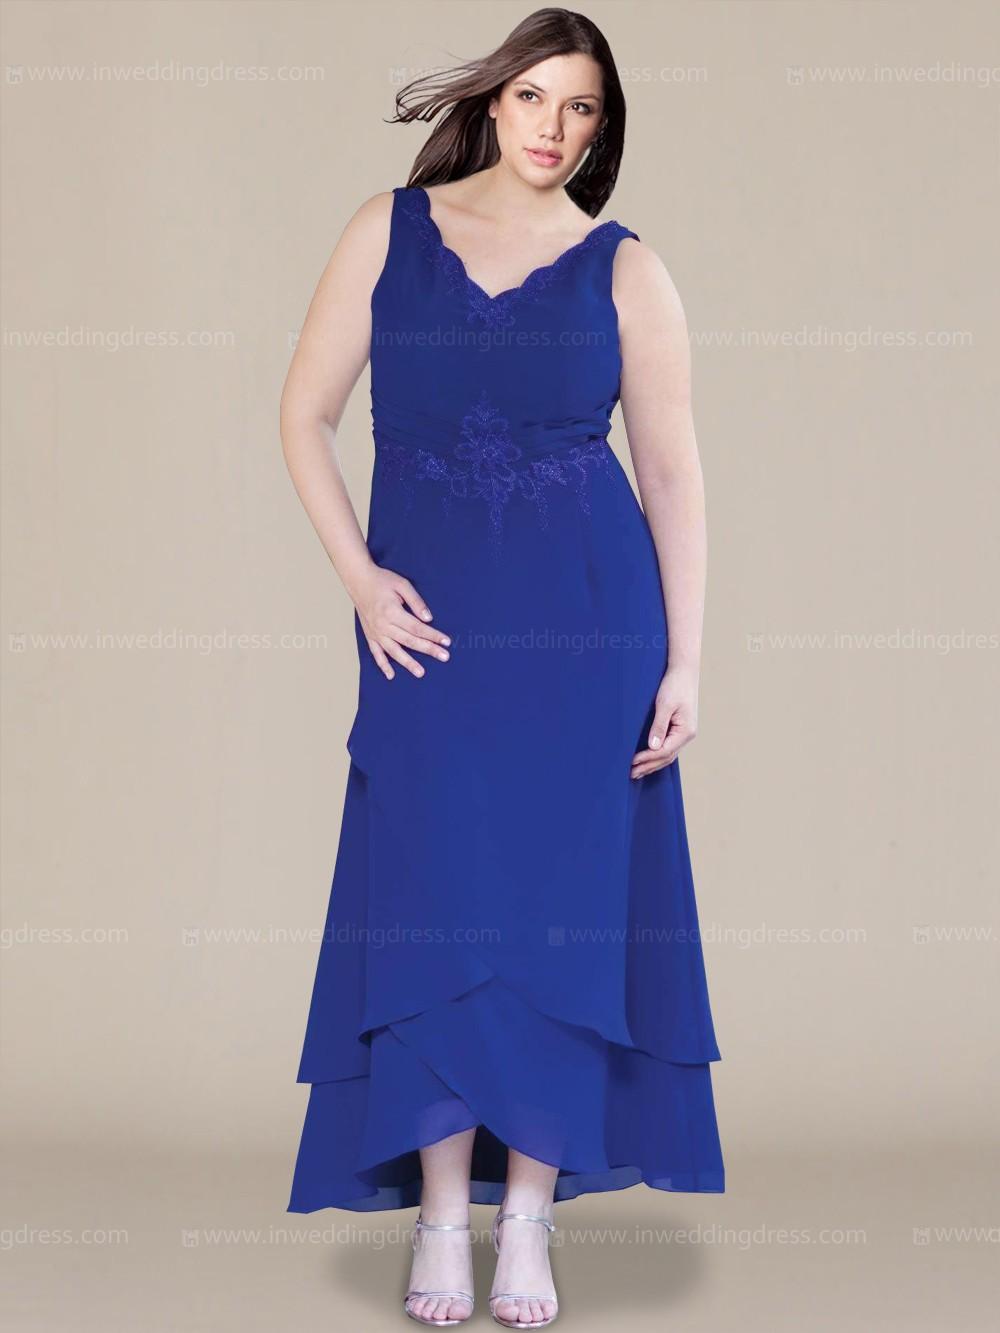 Blue Plus Size Mother Of The Bride Dresses